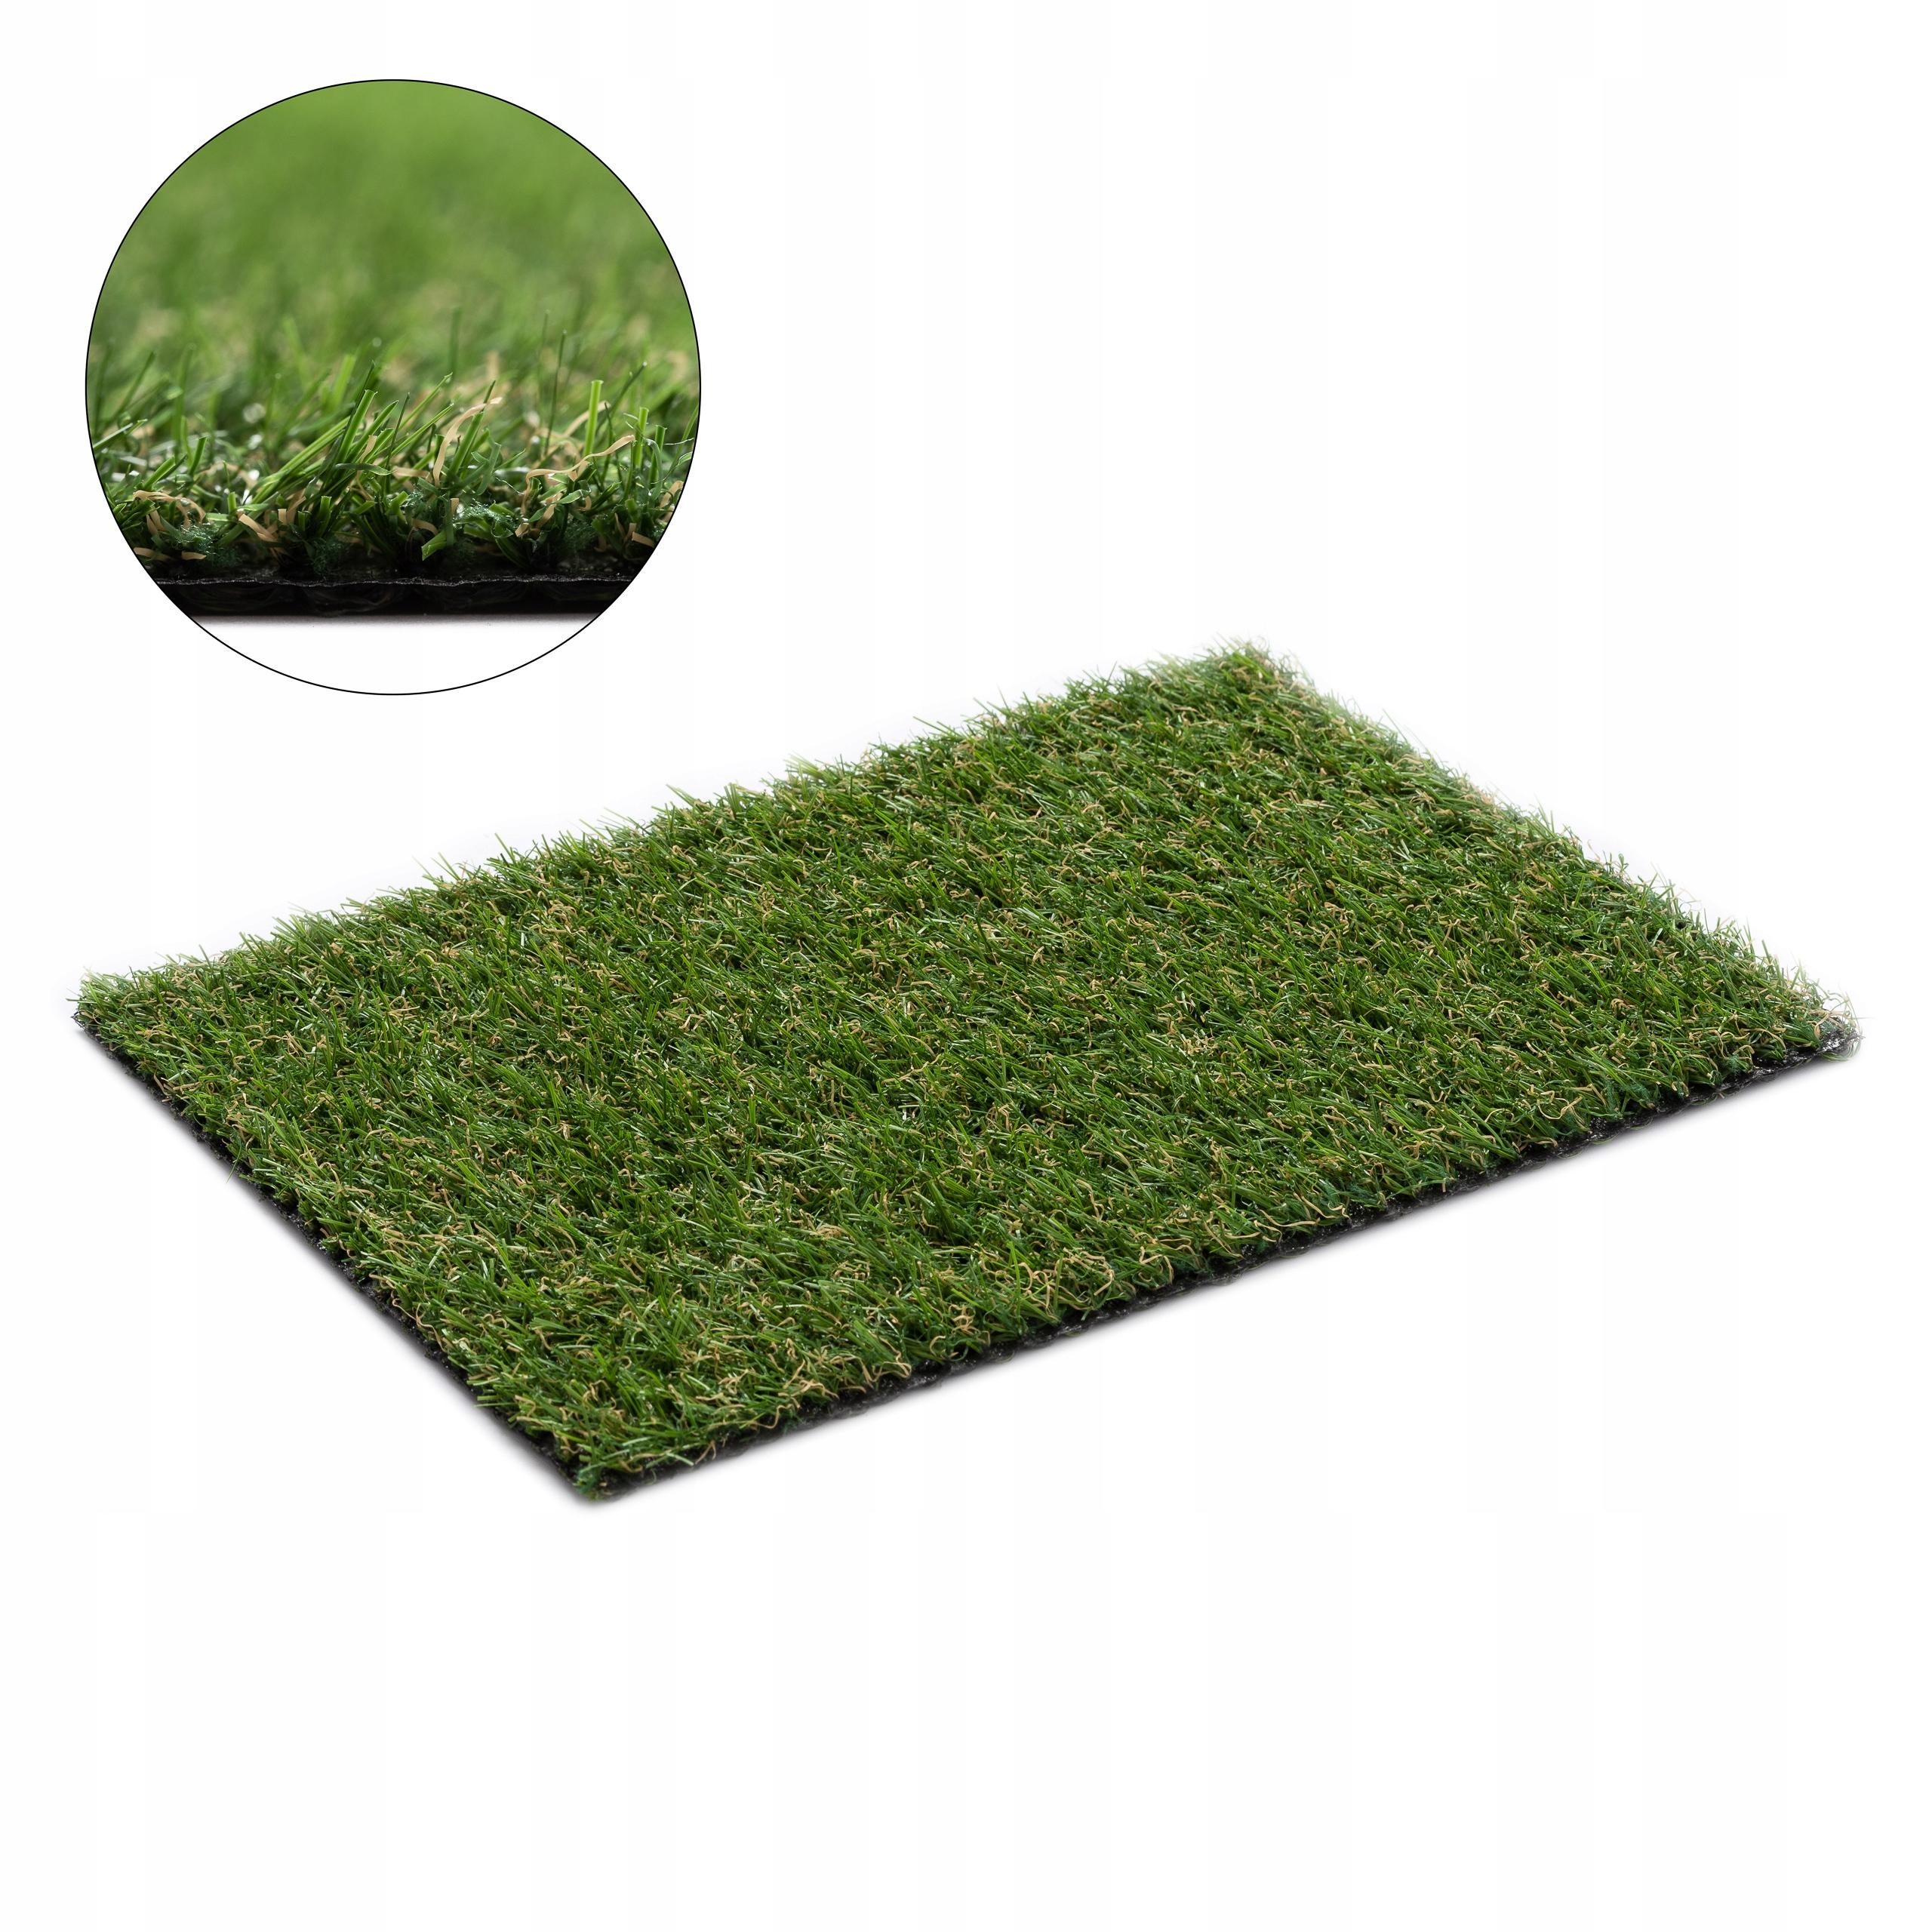 Koberec ZELENÁ BALKÓN GARDEN GRASS ELITE 200x250 cm @87737